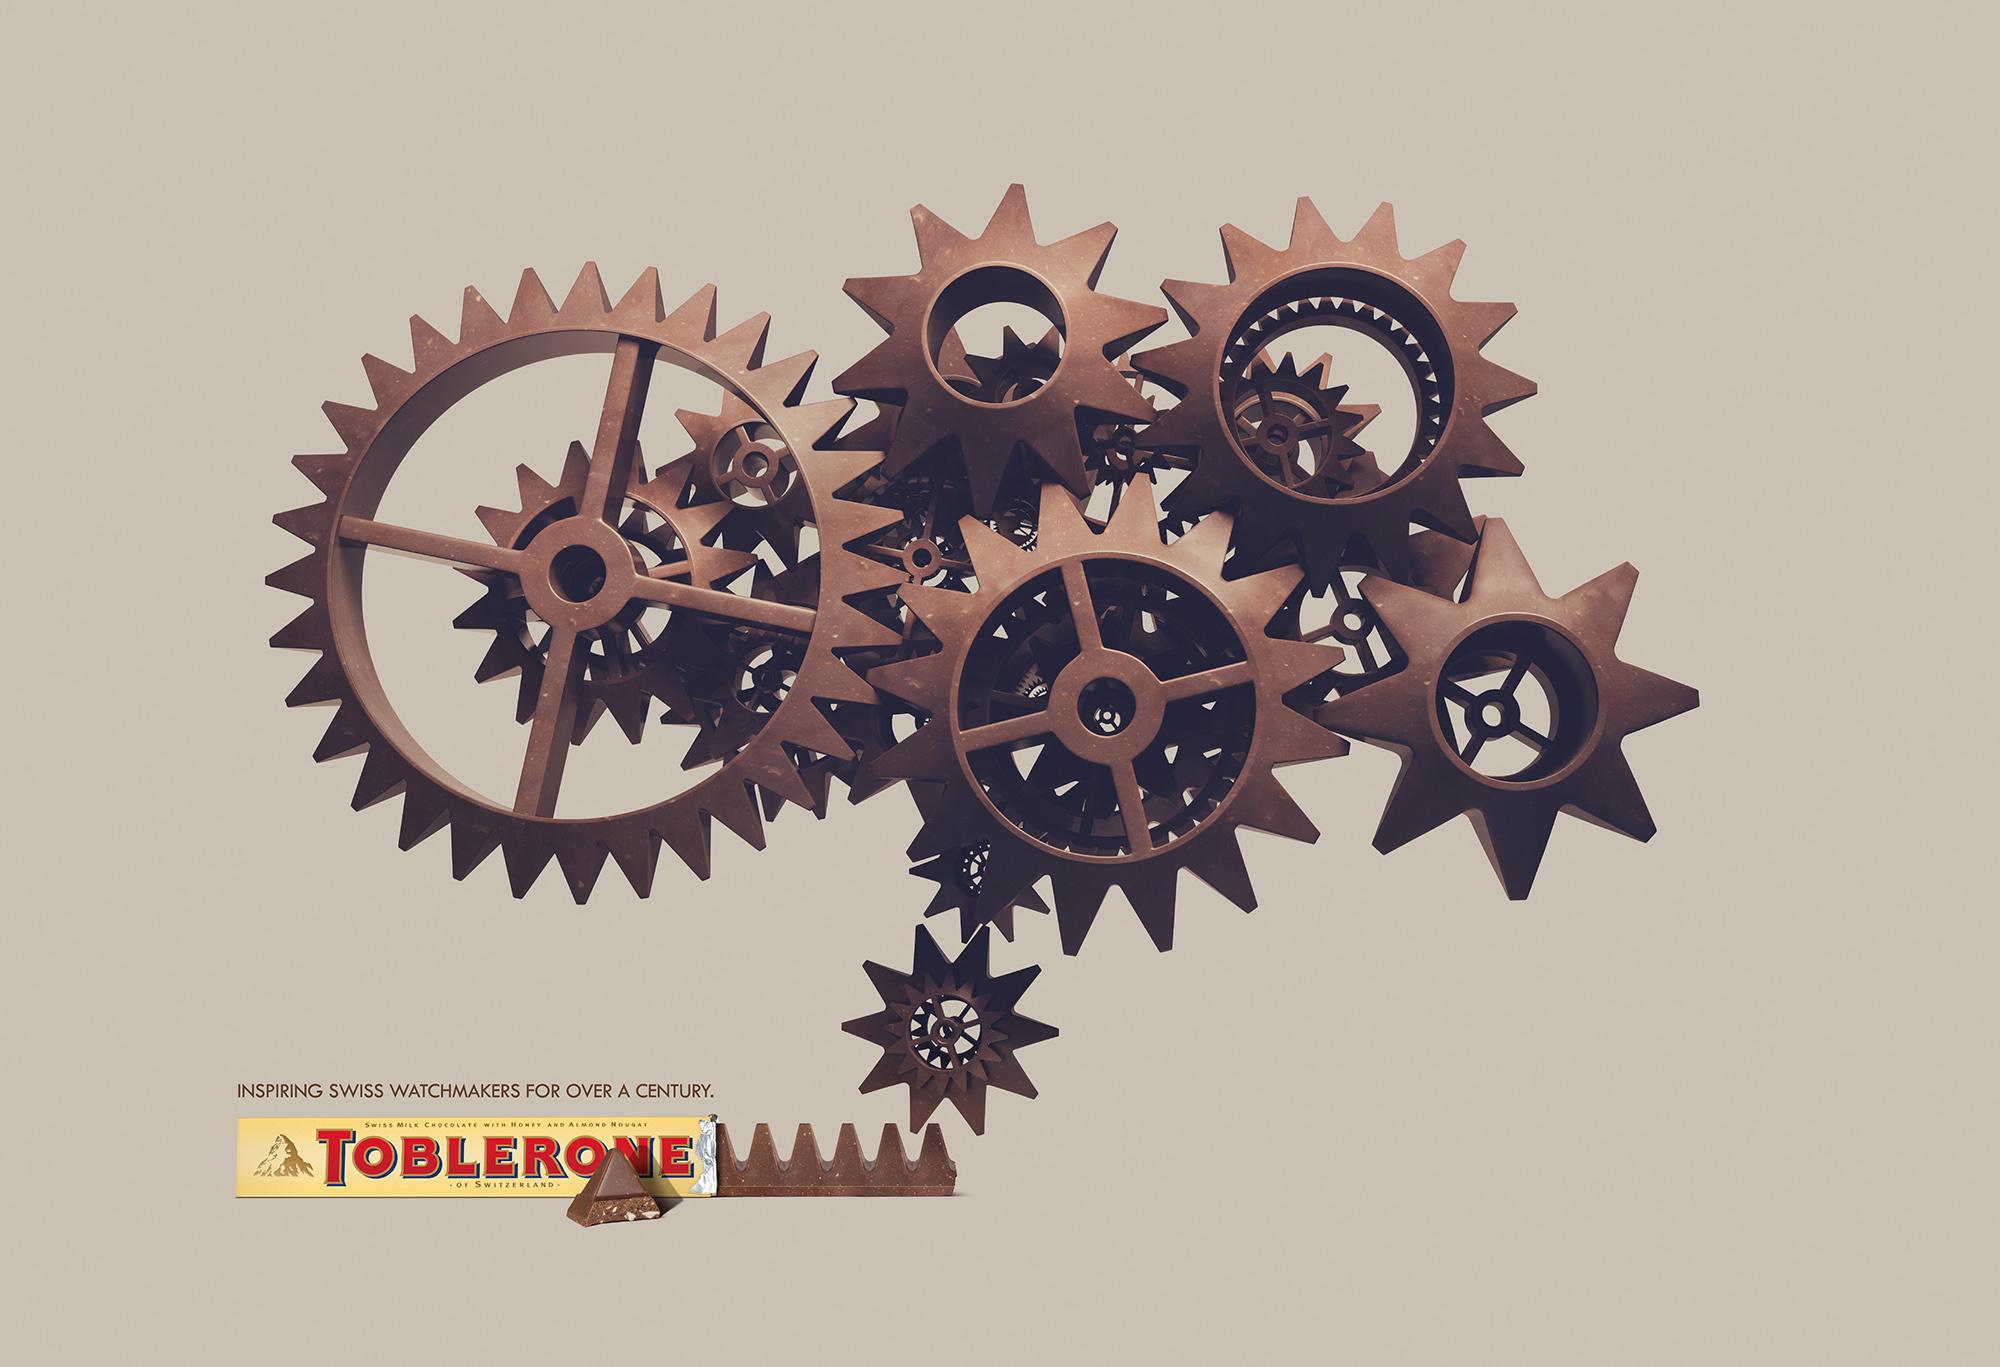 Toblerone - Cogs